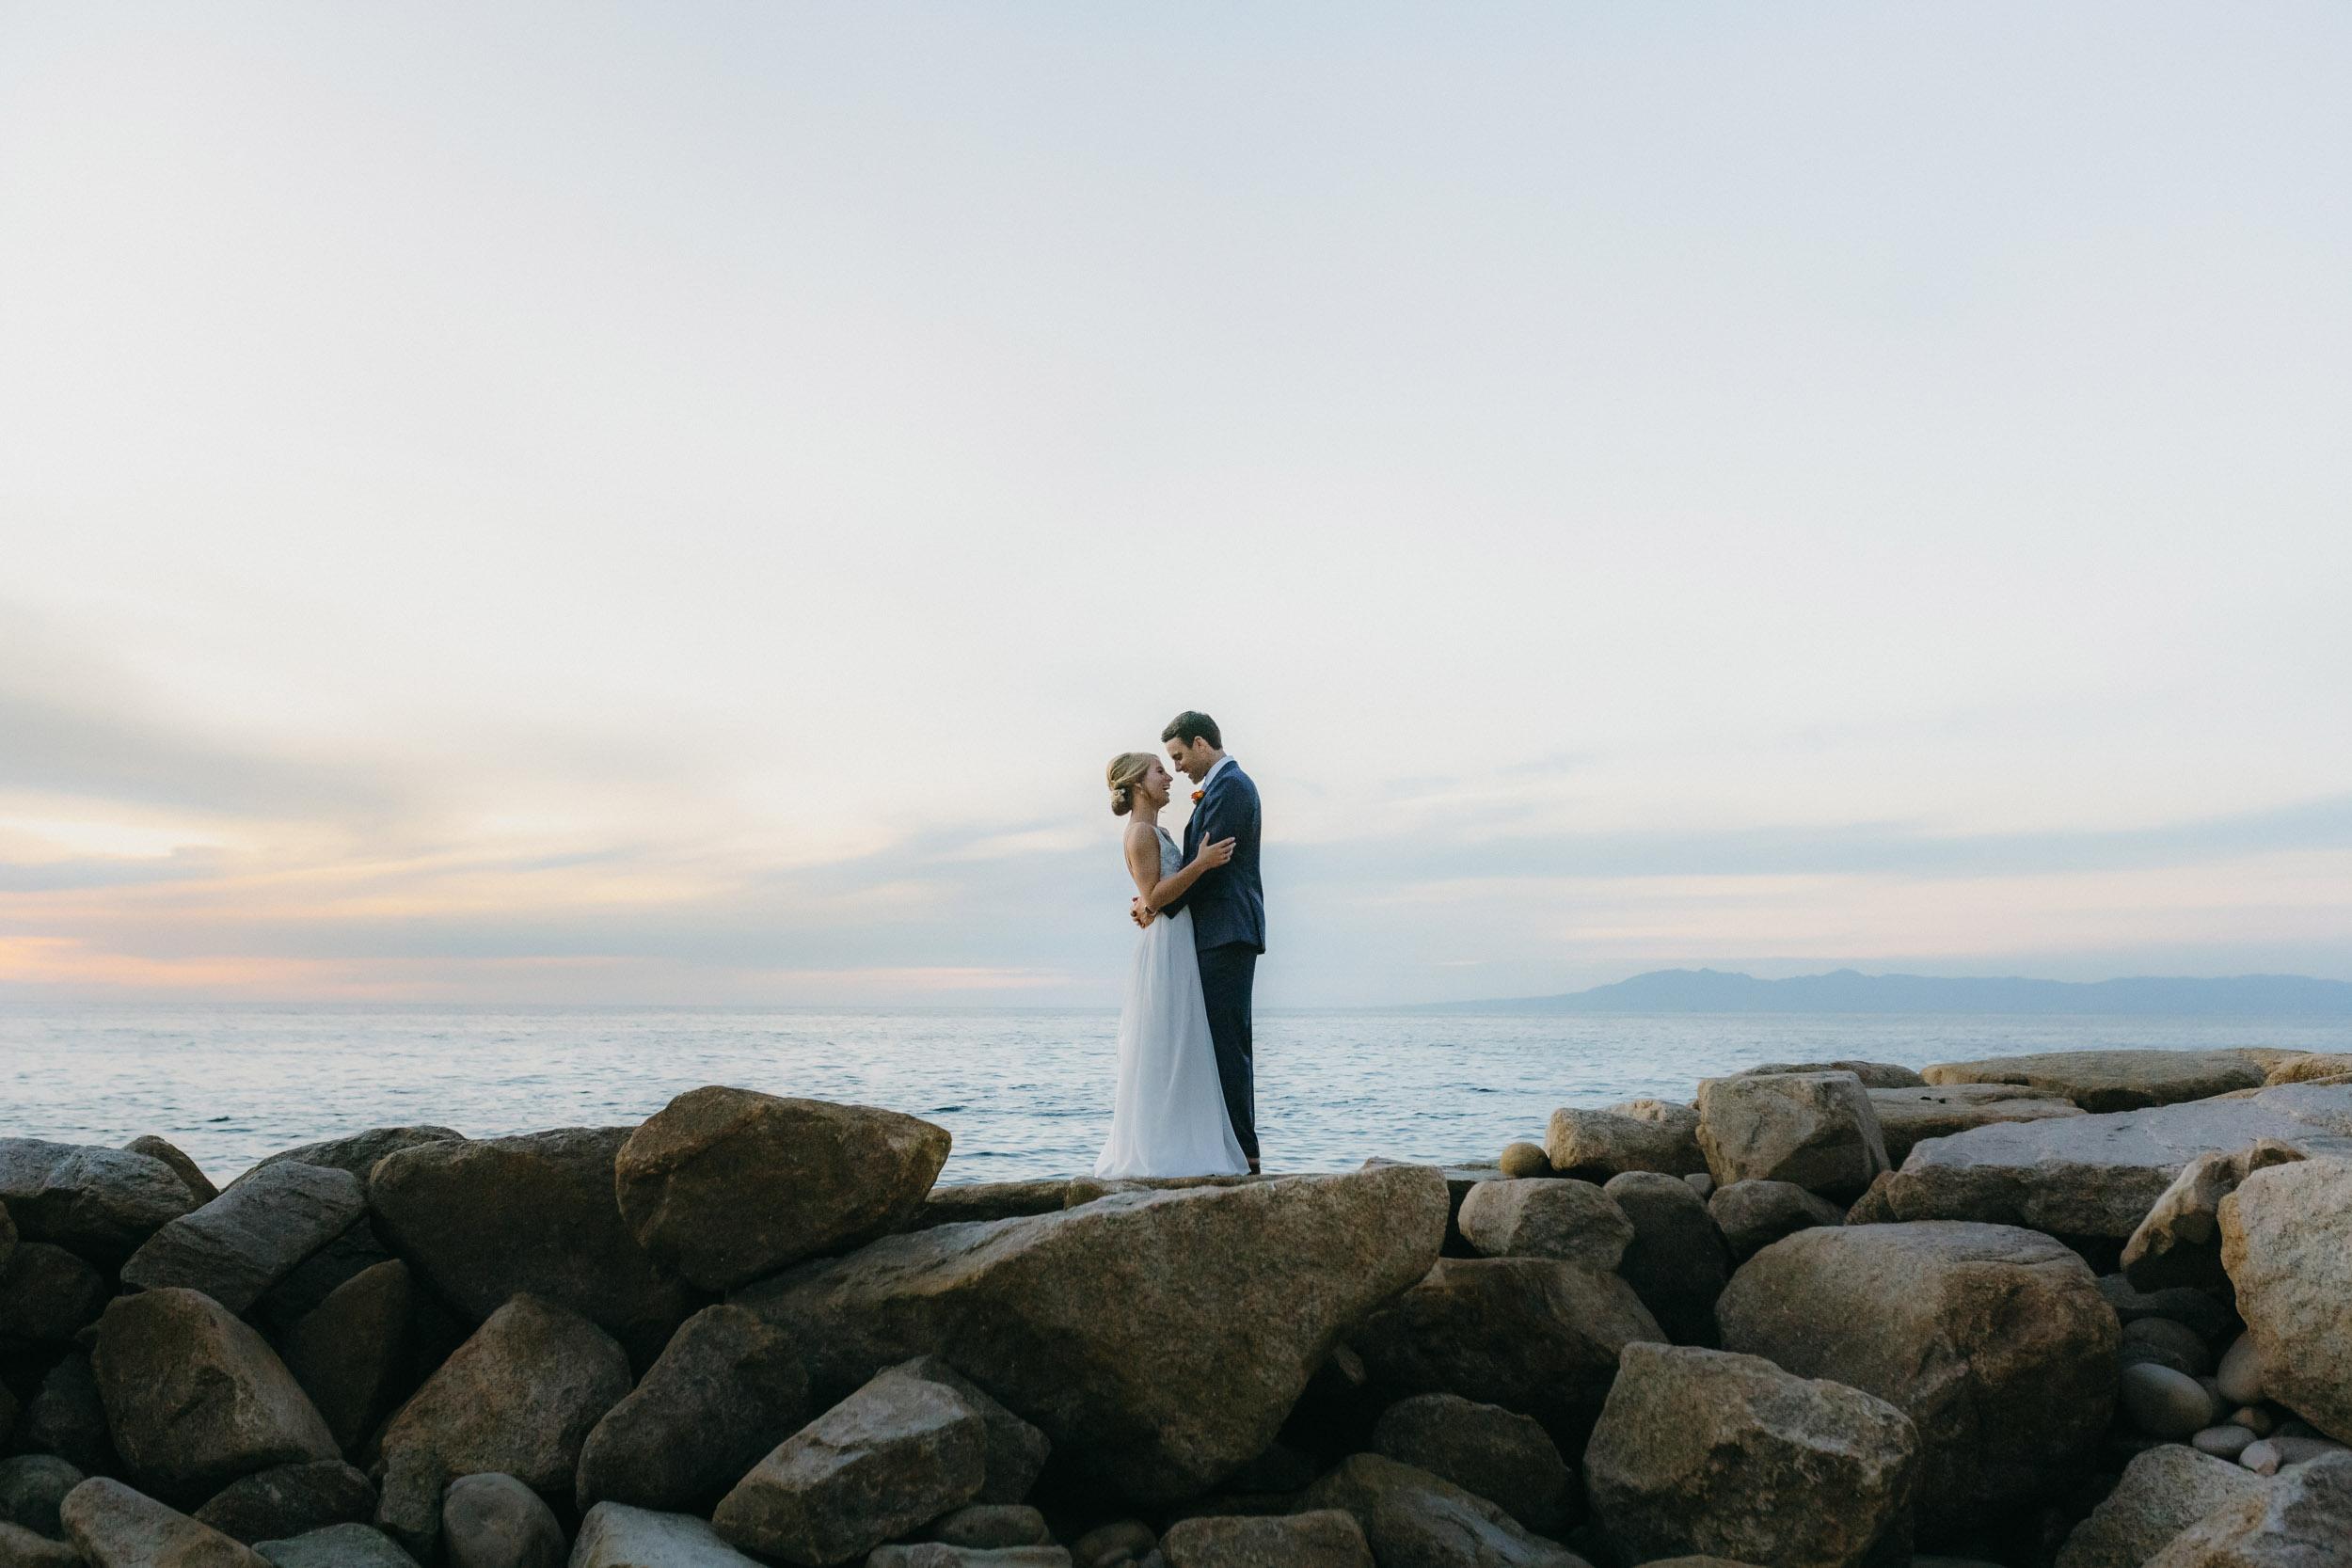 28-minneapolis-based destination wedding photographer-1.jpg